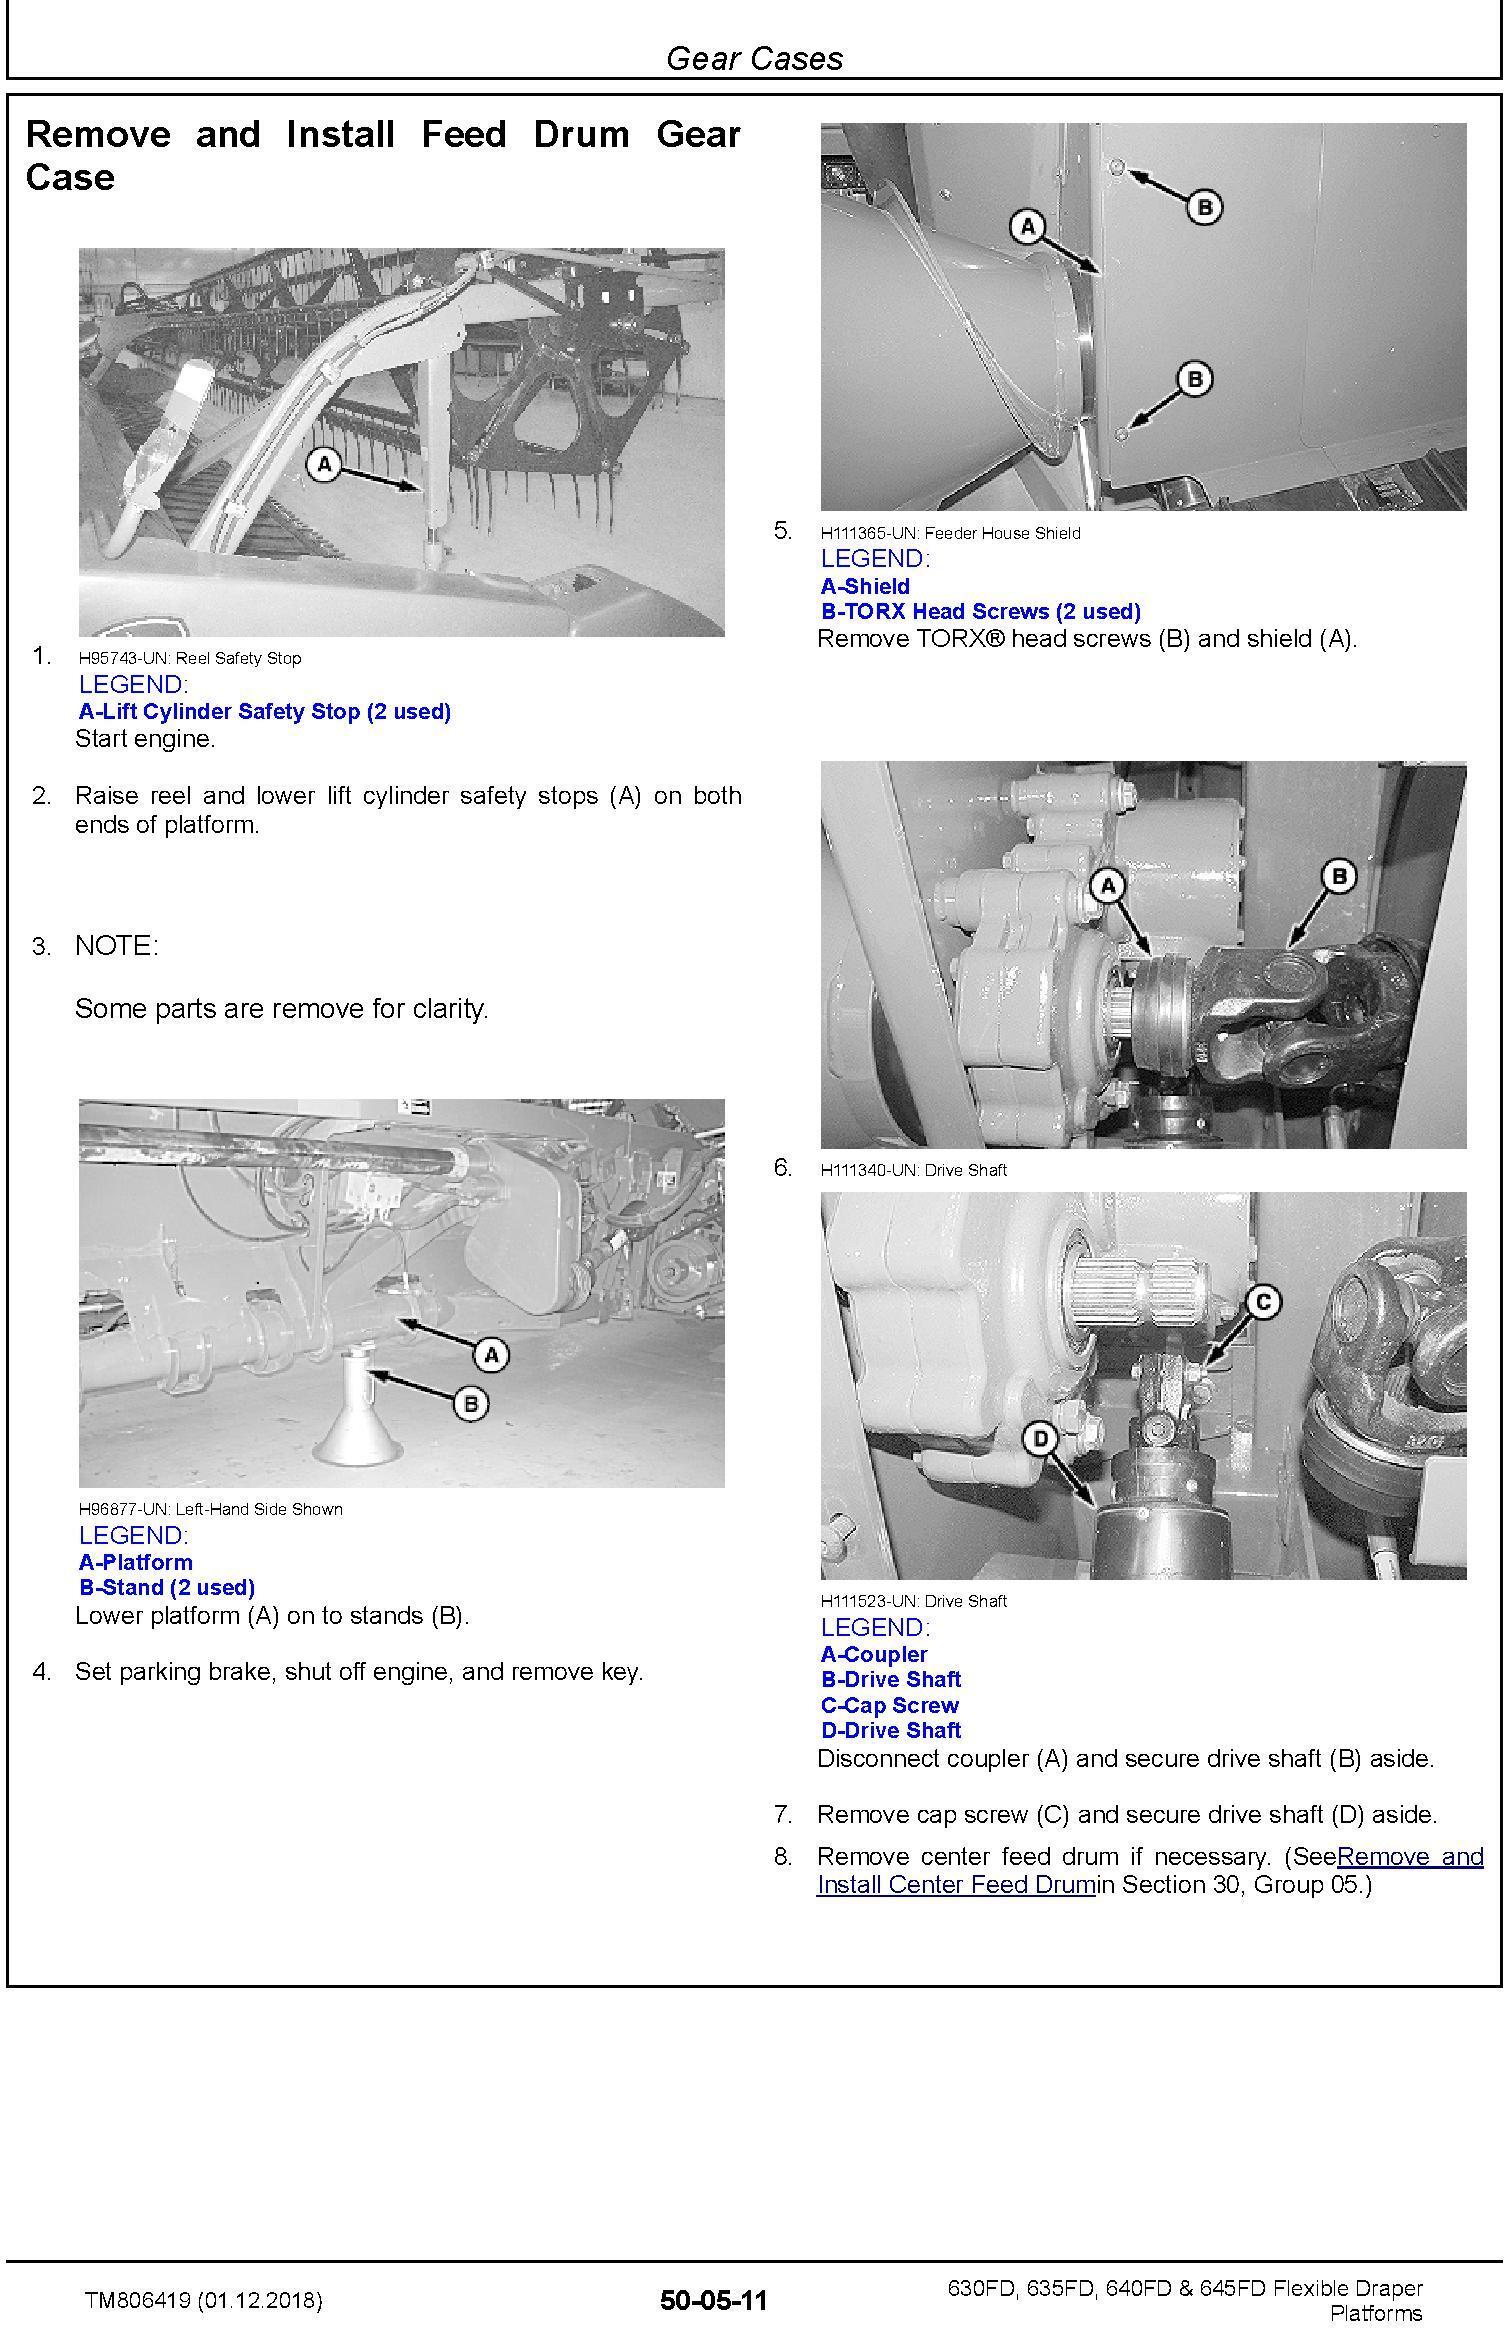 John Deere 630FD, 635FD, 640FD, 645FD Flexible Draper Platform (SN.120100-) Repair Manual (TM806419) - 2